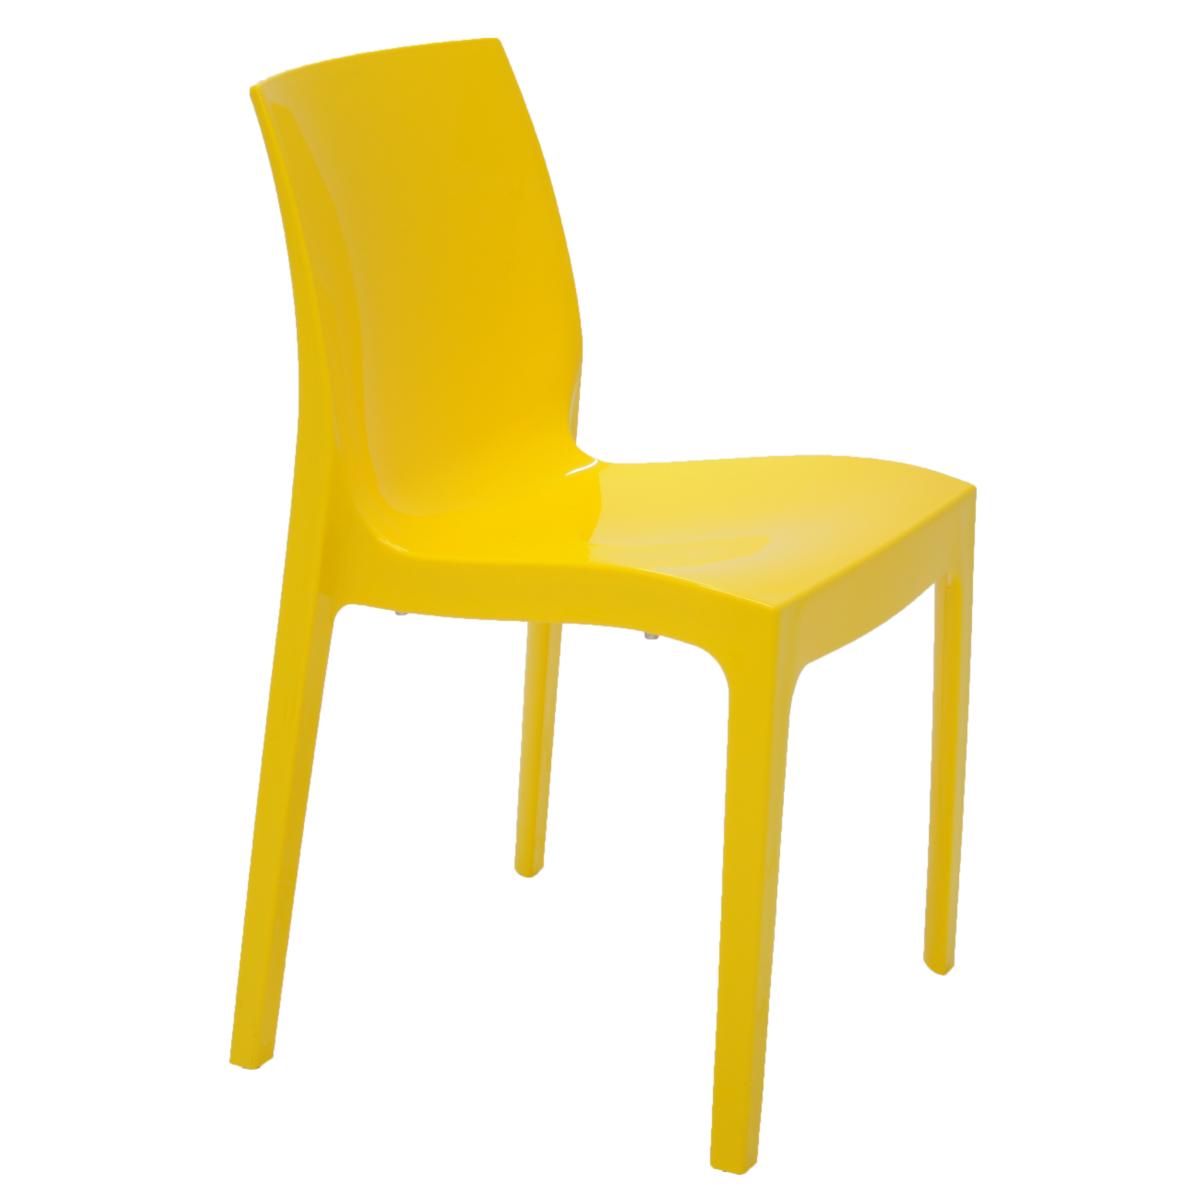 Cadeira Tramontina Alice Amarelo 92037/000 1 Peça